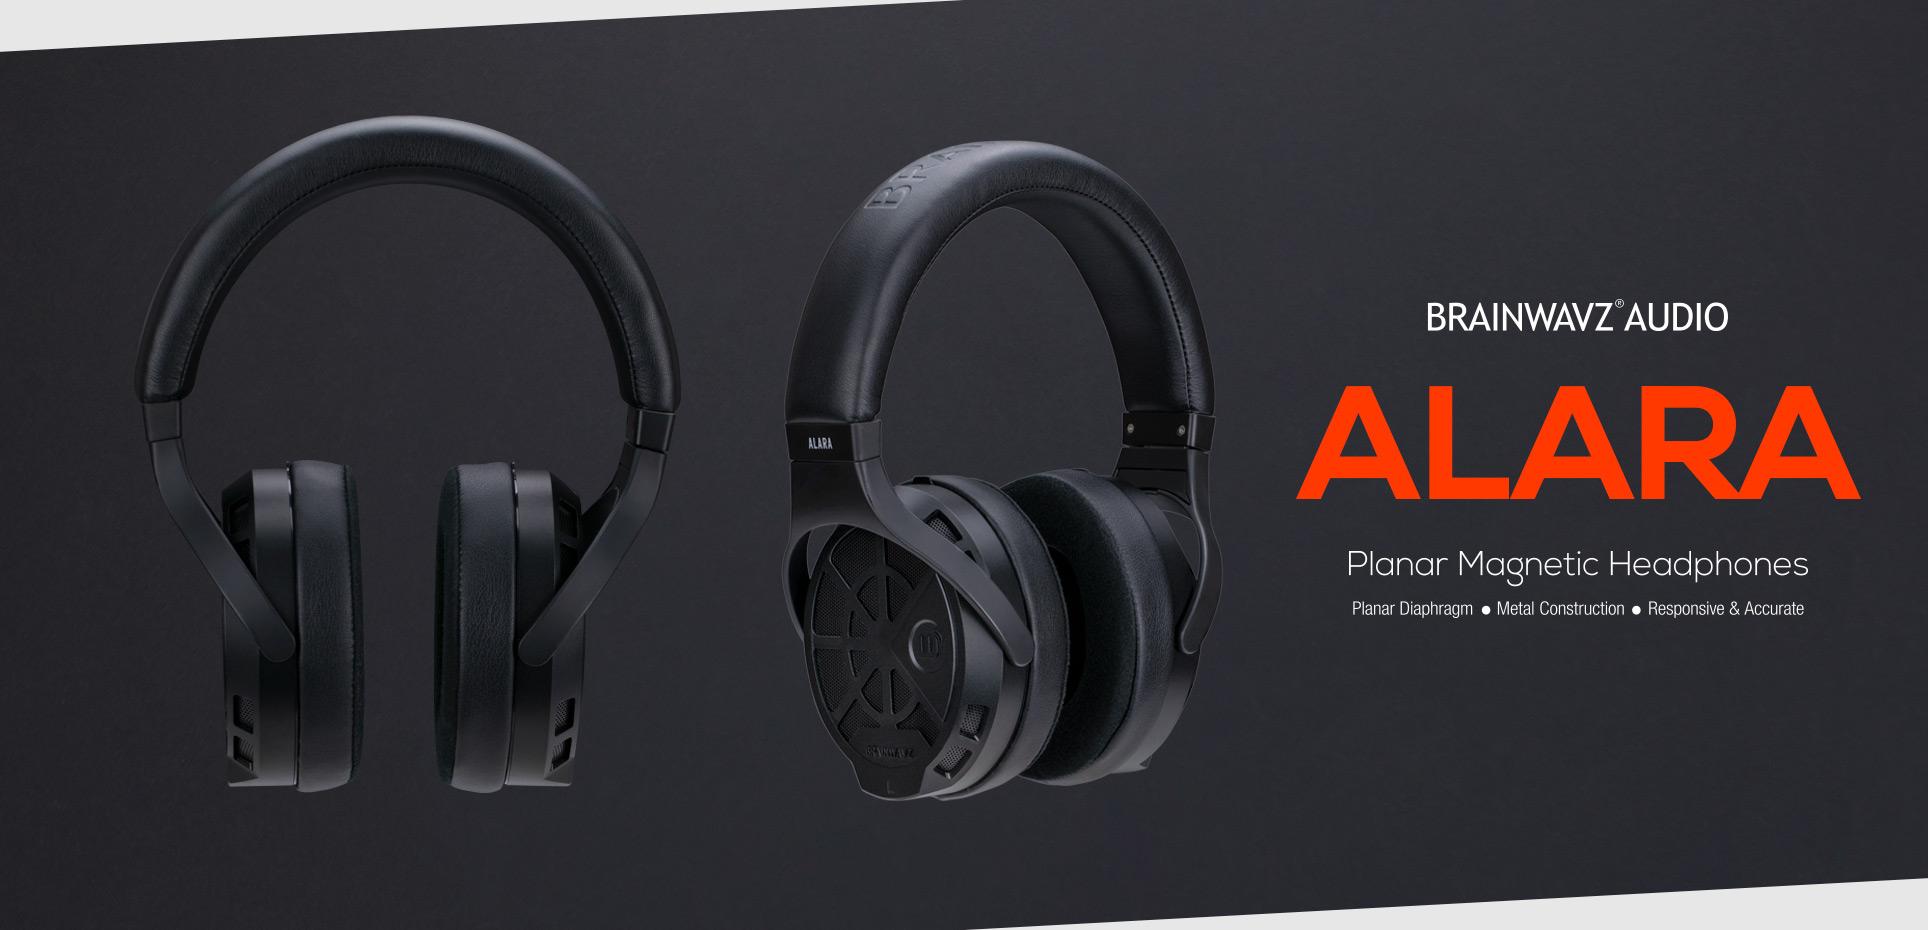 Brainwavz Audio